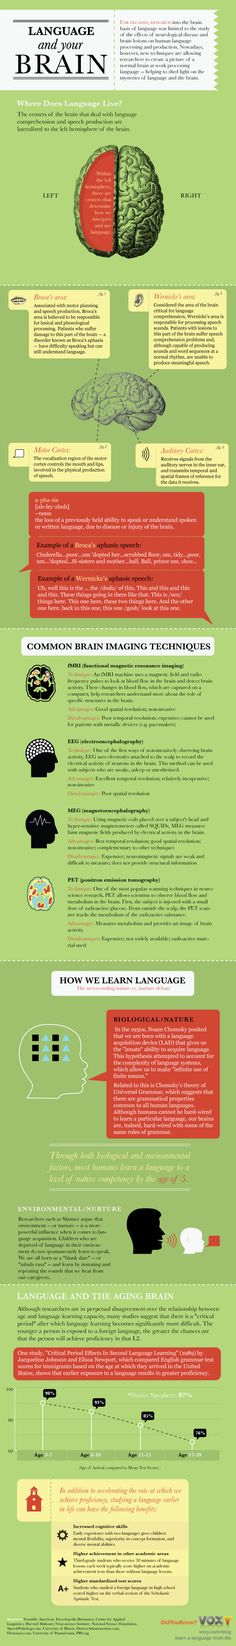 Language and Your Brain #language #brain #learning